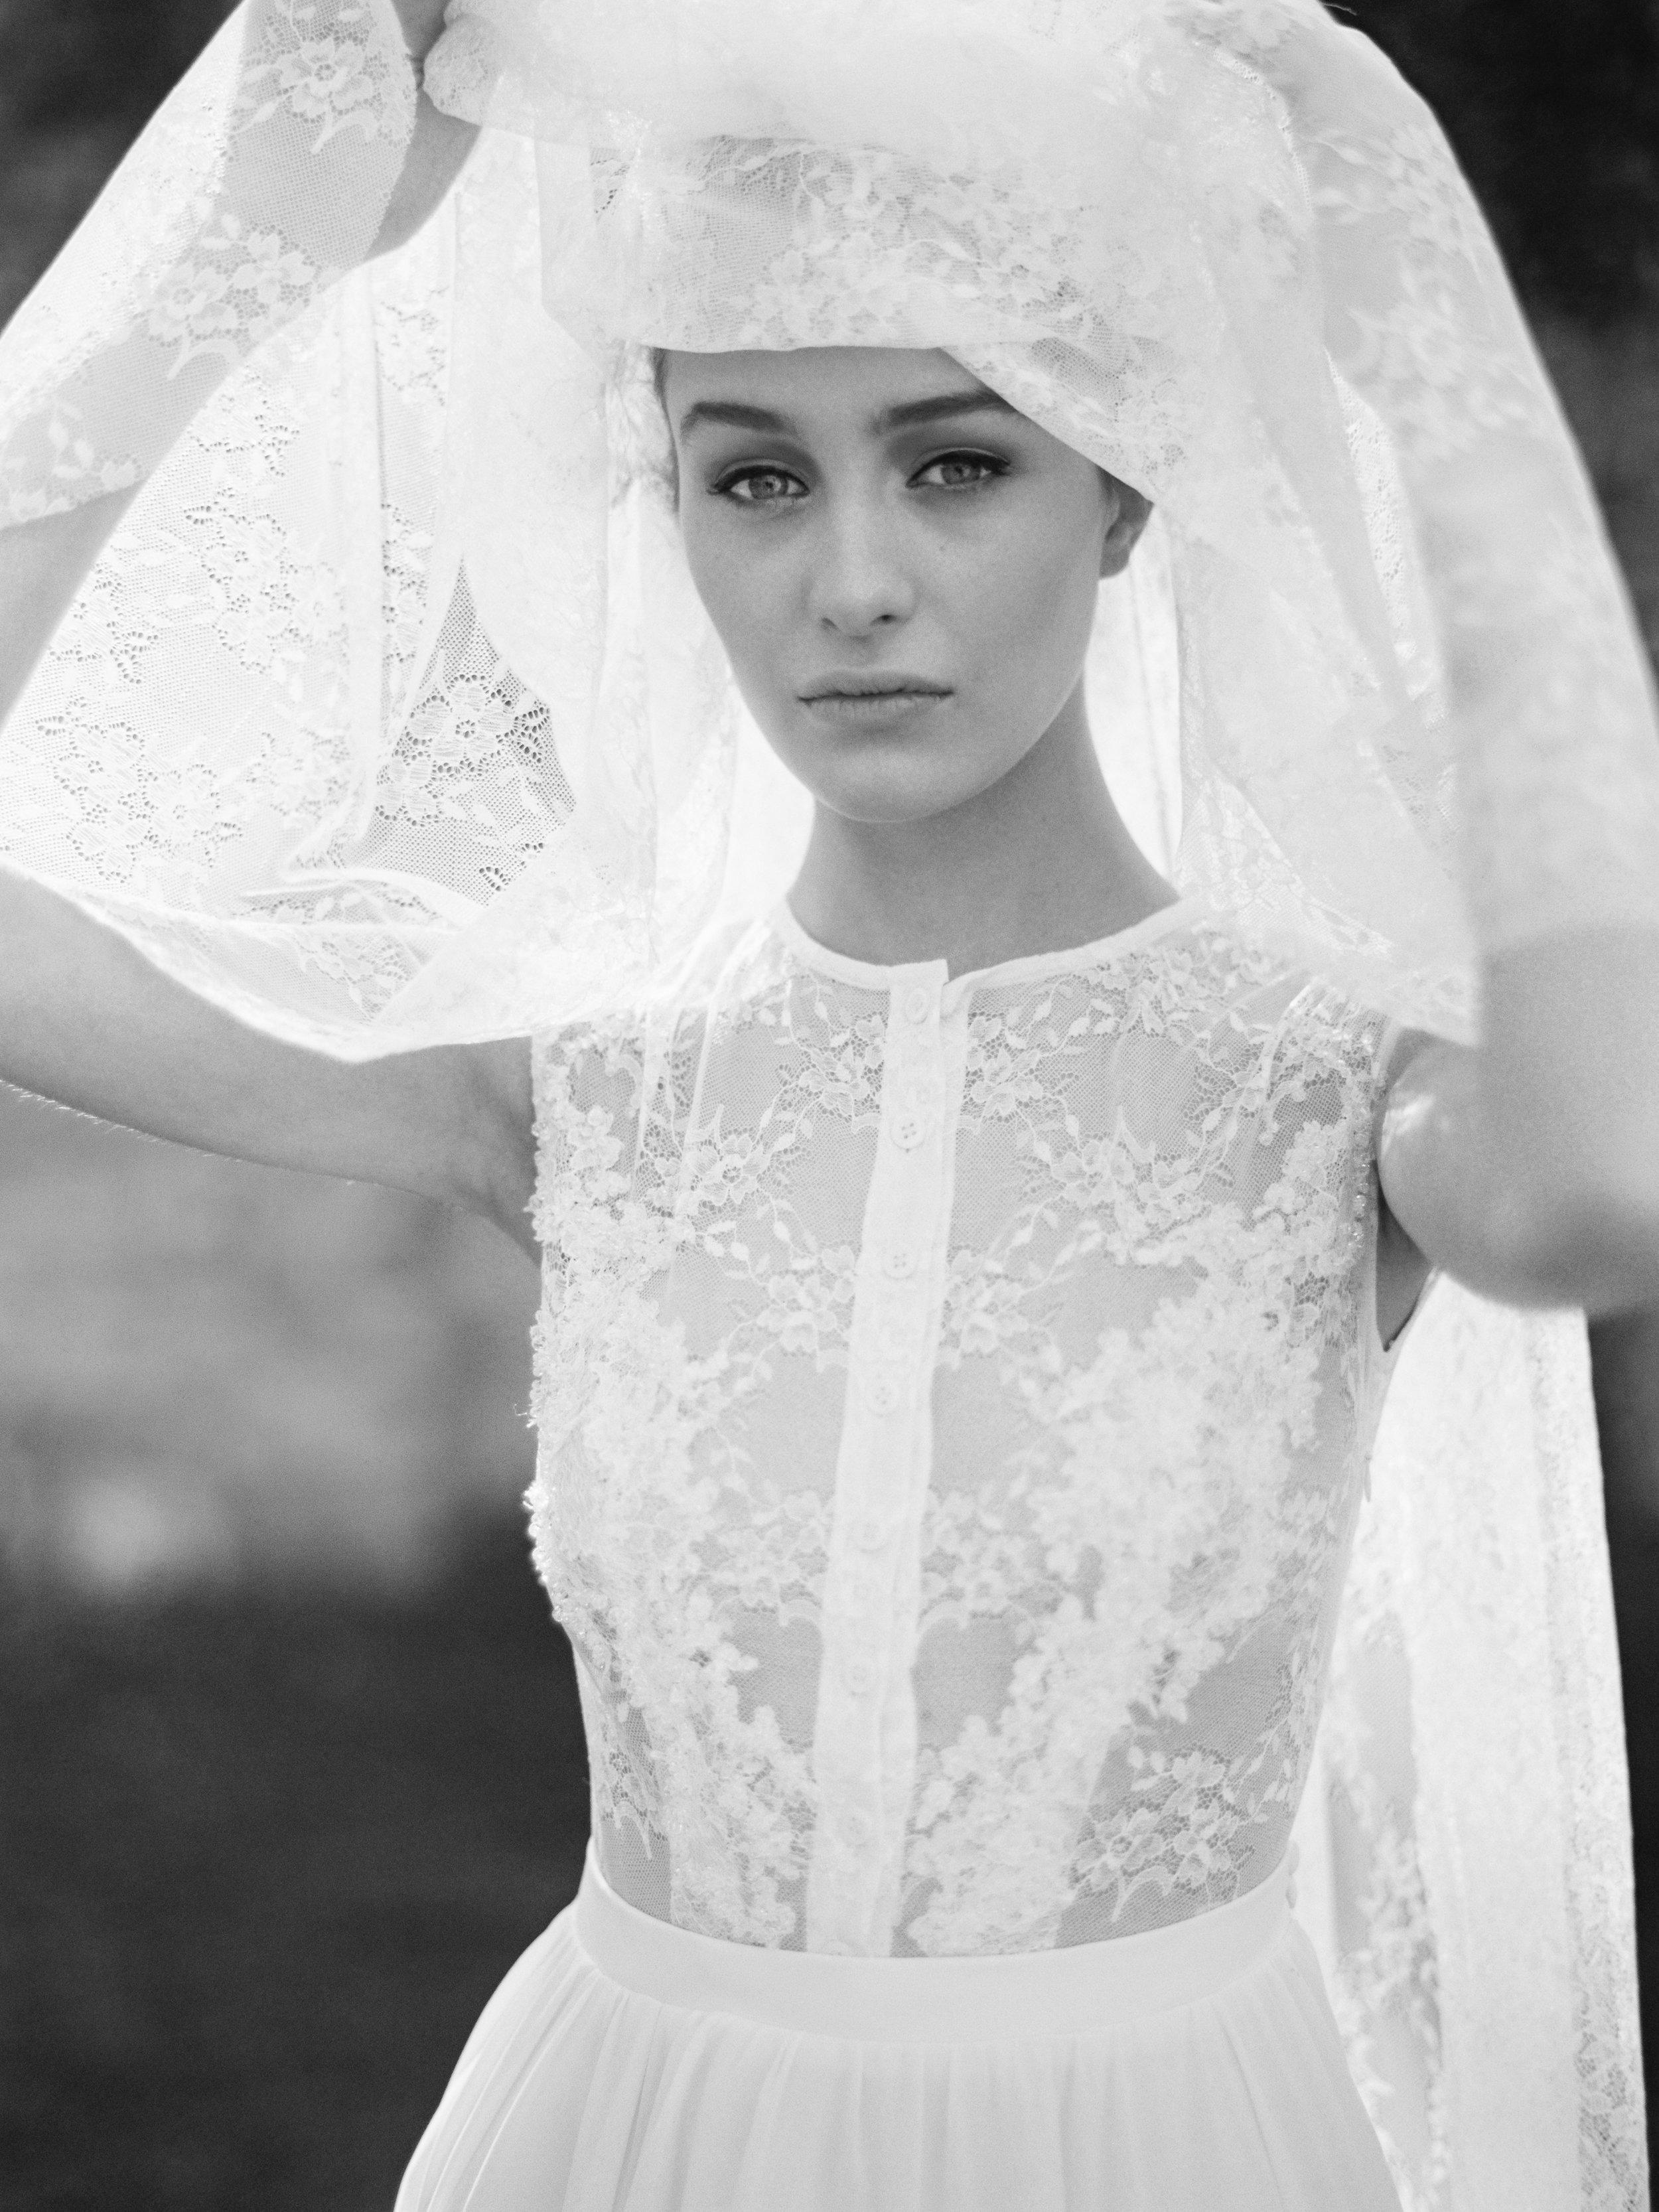 TamaraGigolaphotography,Cathytelle,royalweddingdress,kakheti-0037-6-2.JPG